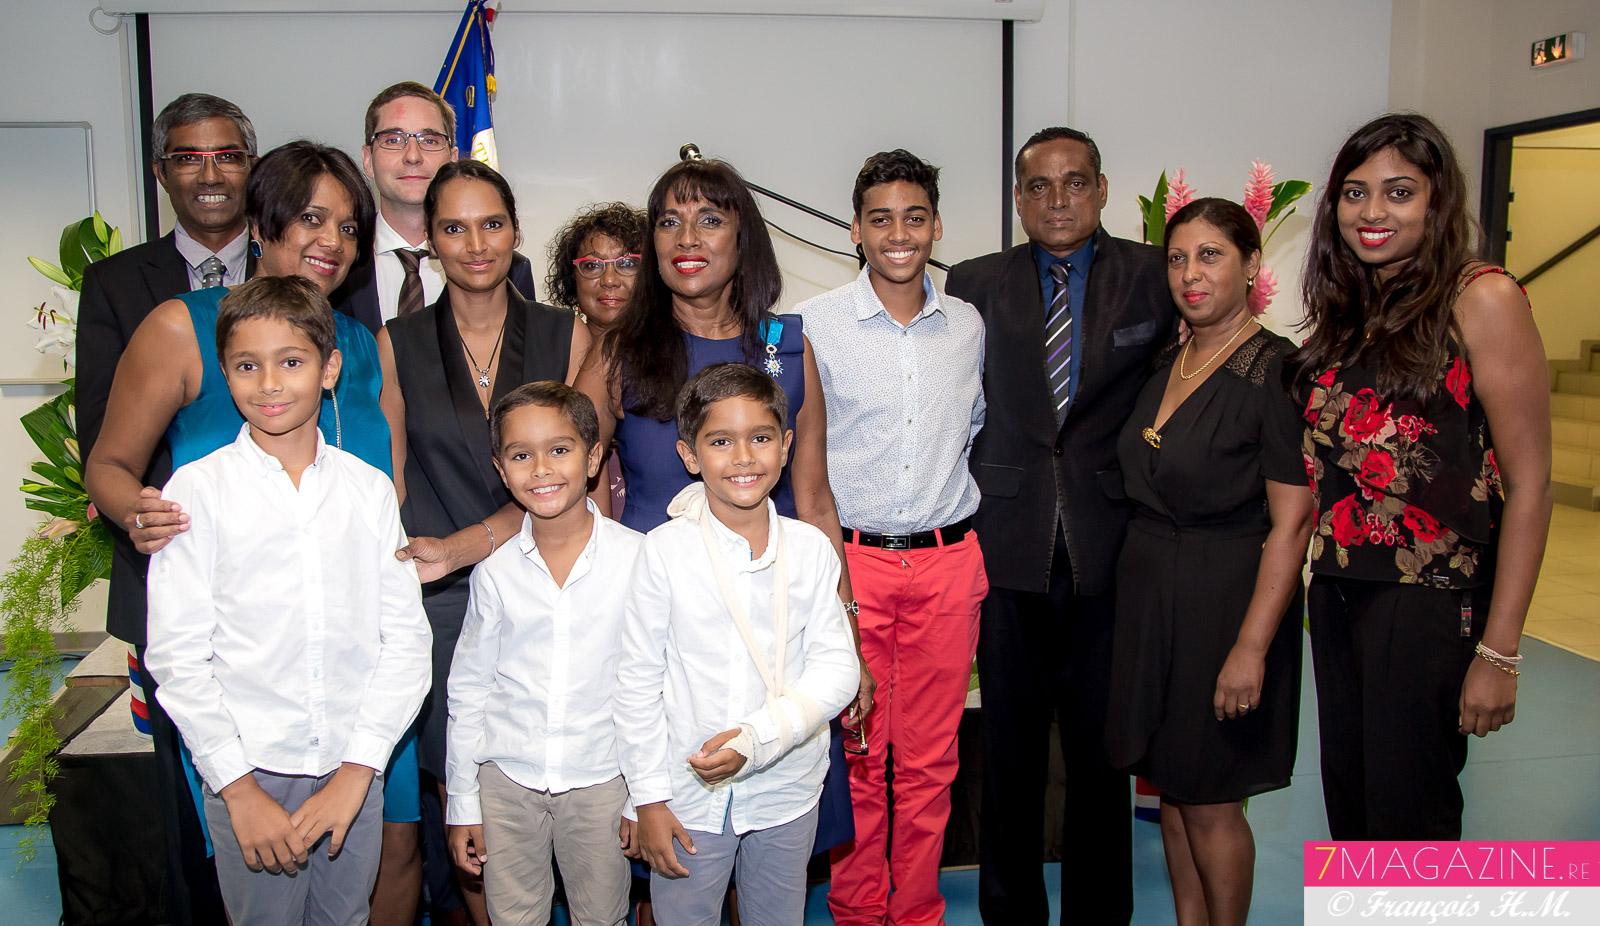 Ida Mag Camalon entourée de sa famille présente